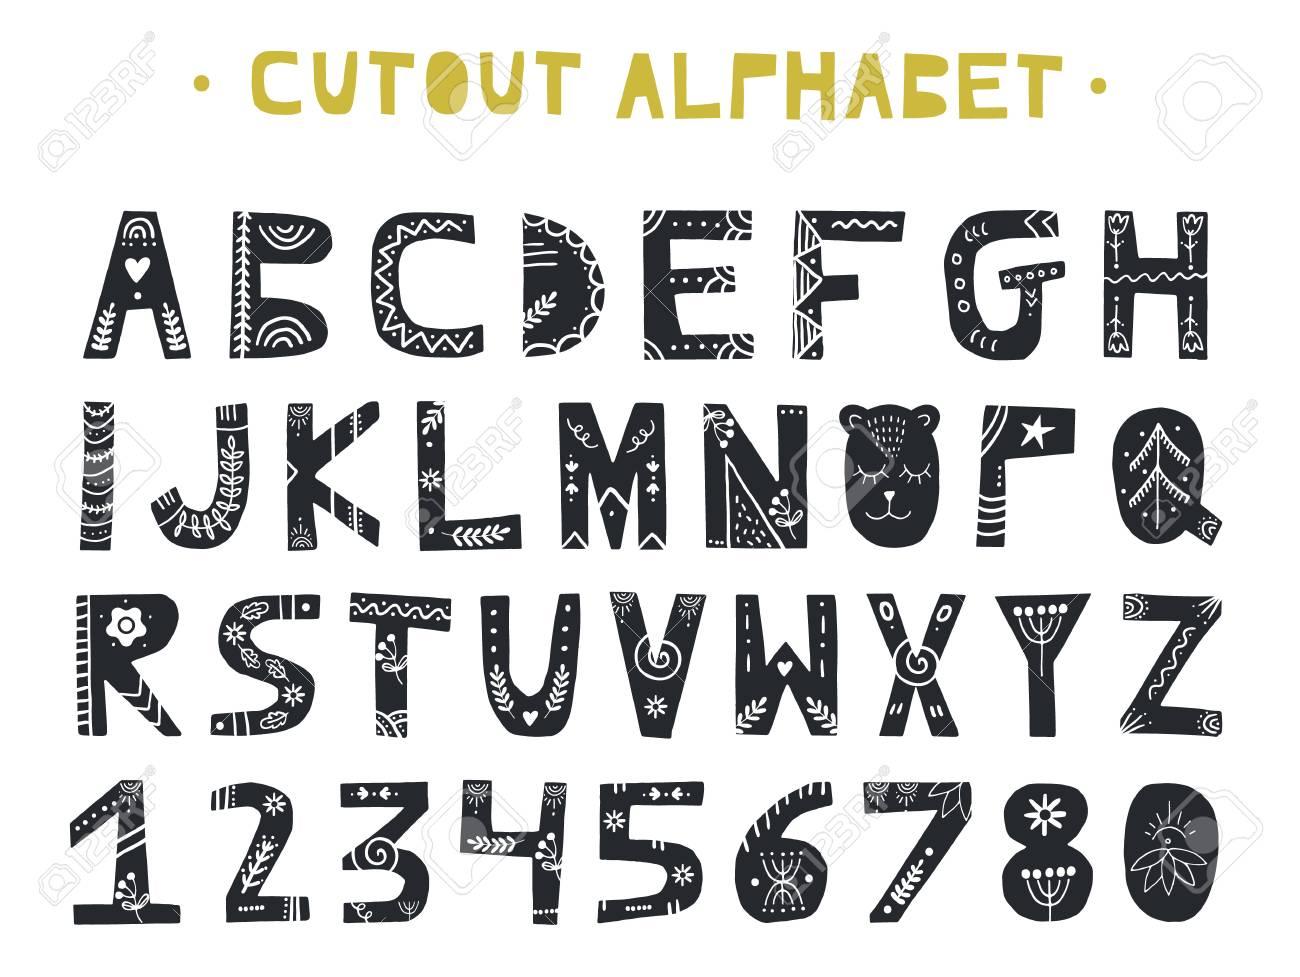 Cutout ABC - Latin alphabet. Unique handmade letters folk art ornament in scandinavian style. Vector illustration. - 93015671